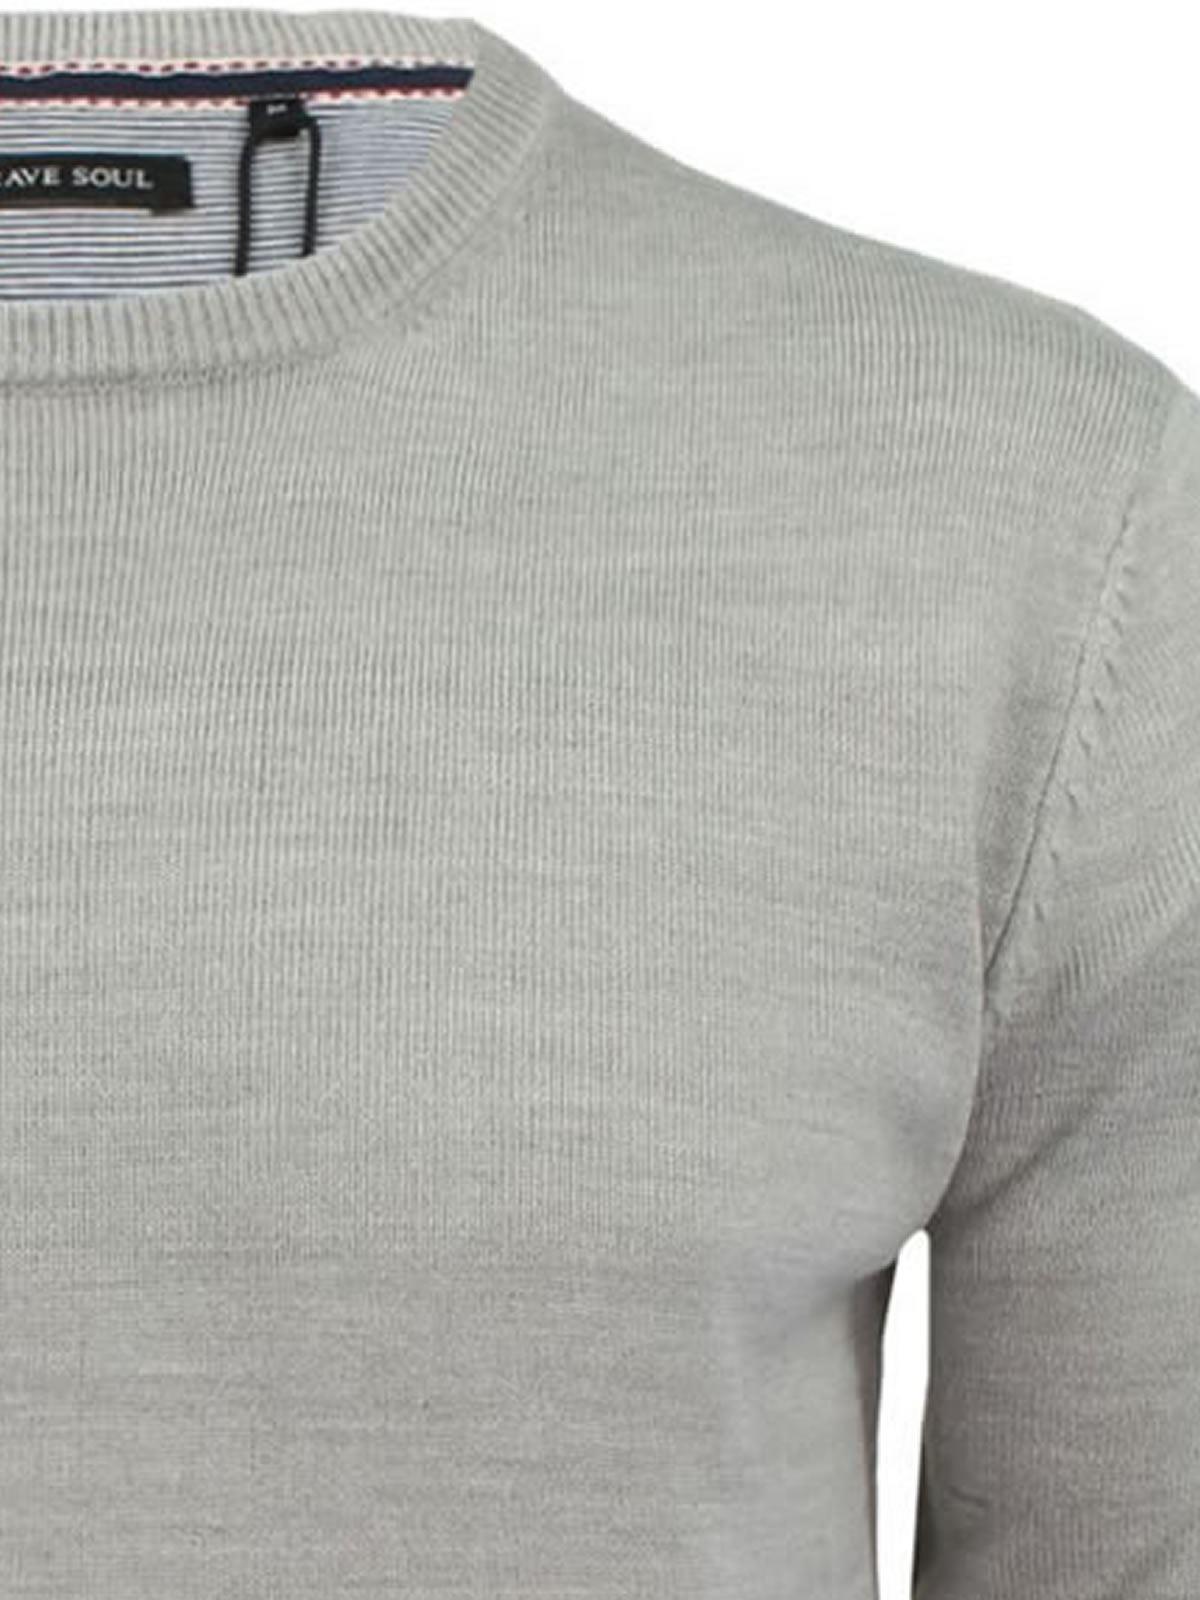 Mens-Jumper-Brave-Soul-Urbain-Knitted-Crew-Neck-Sweater thumbnail 22